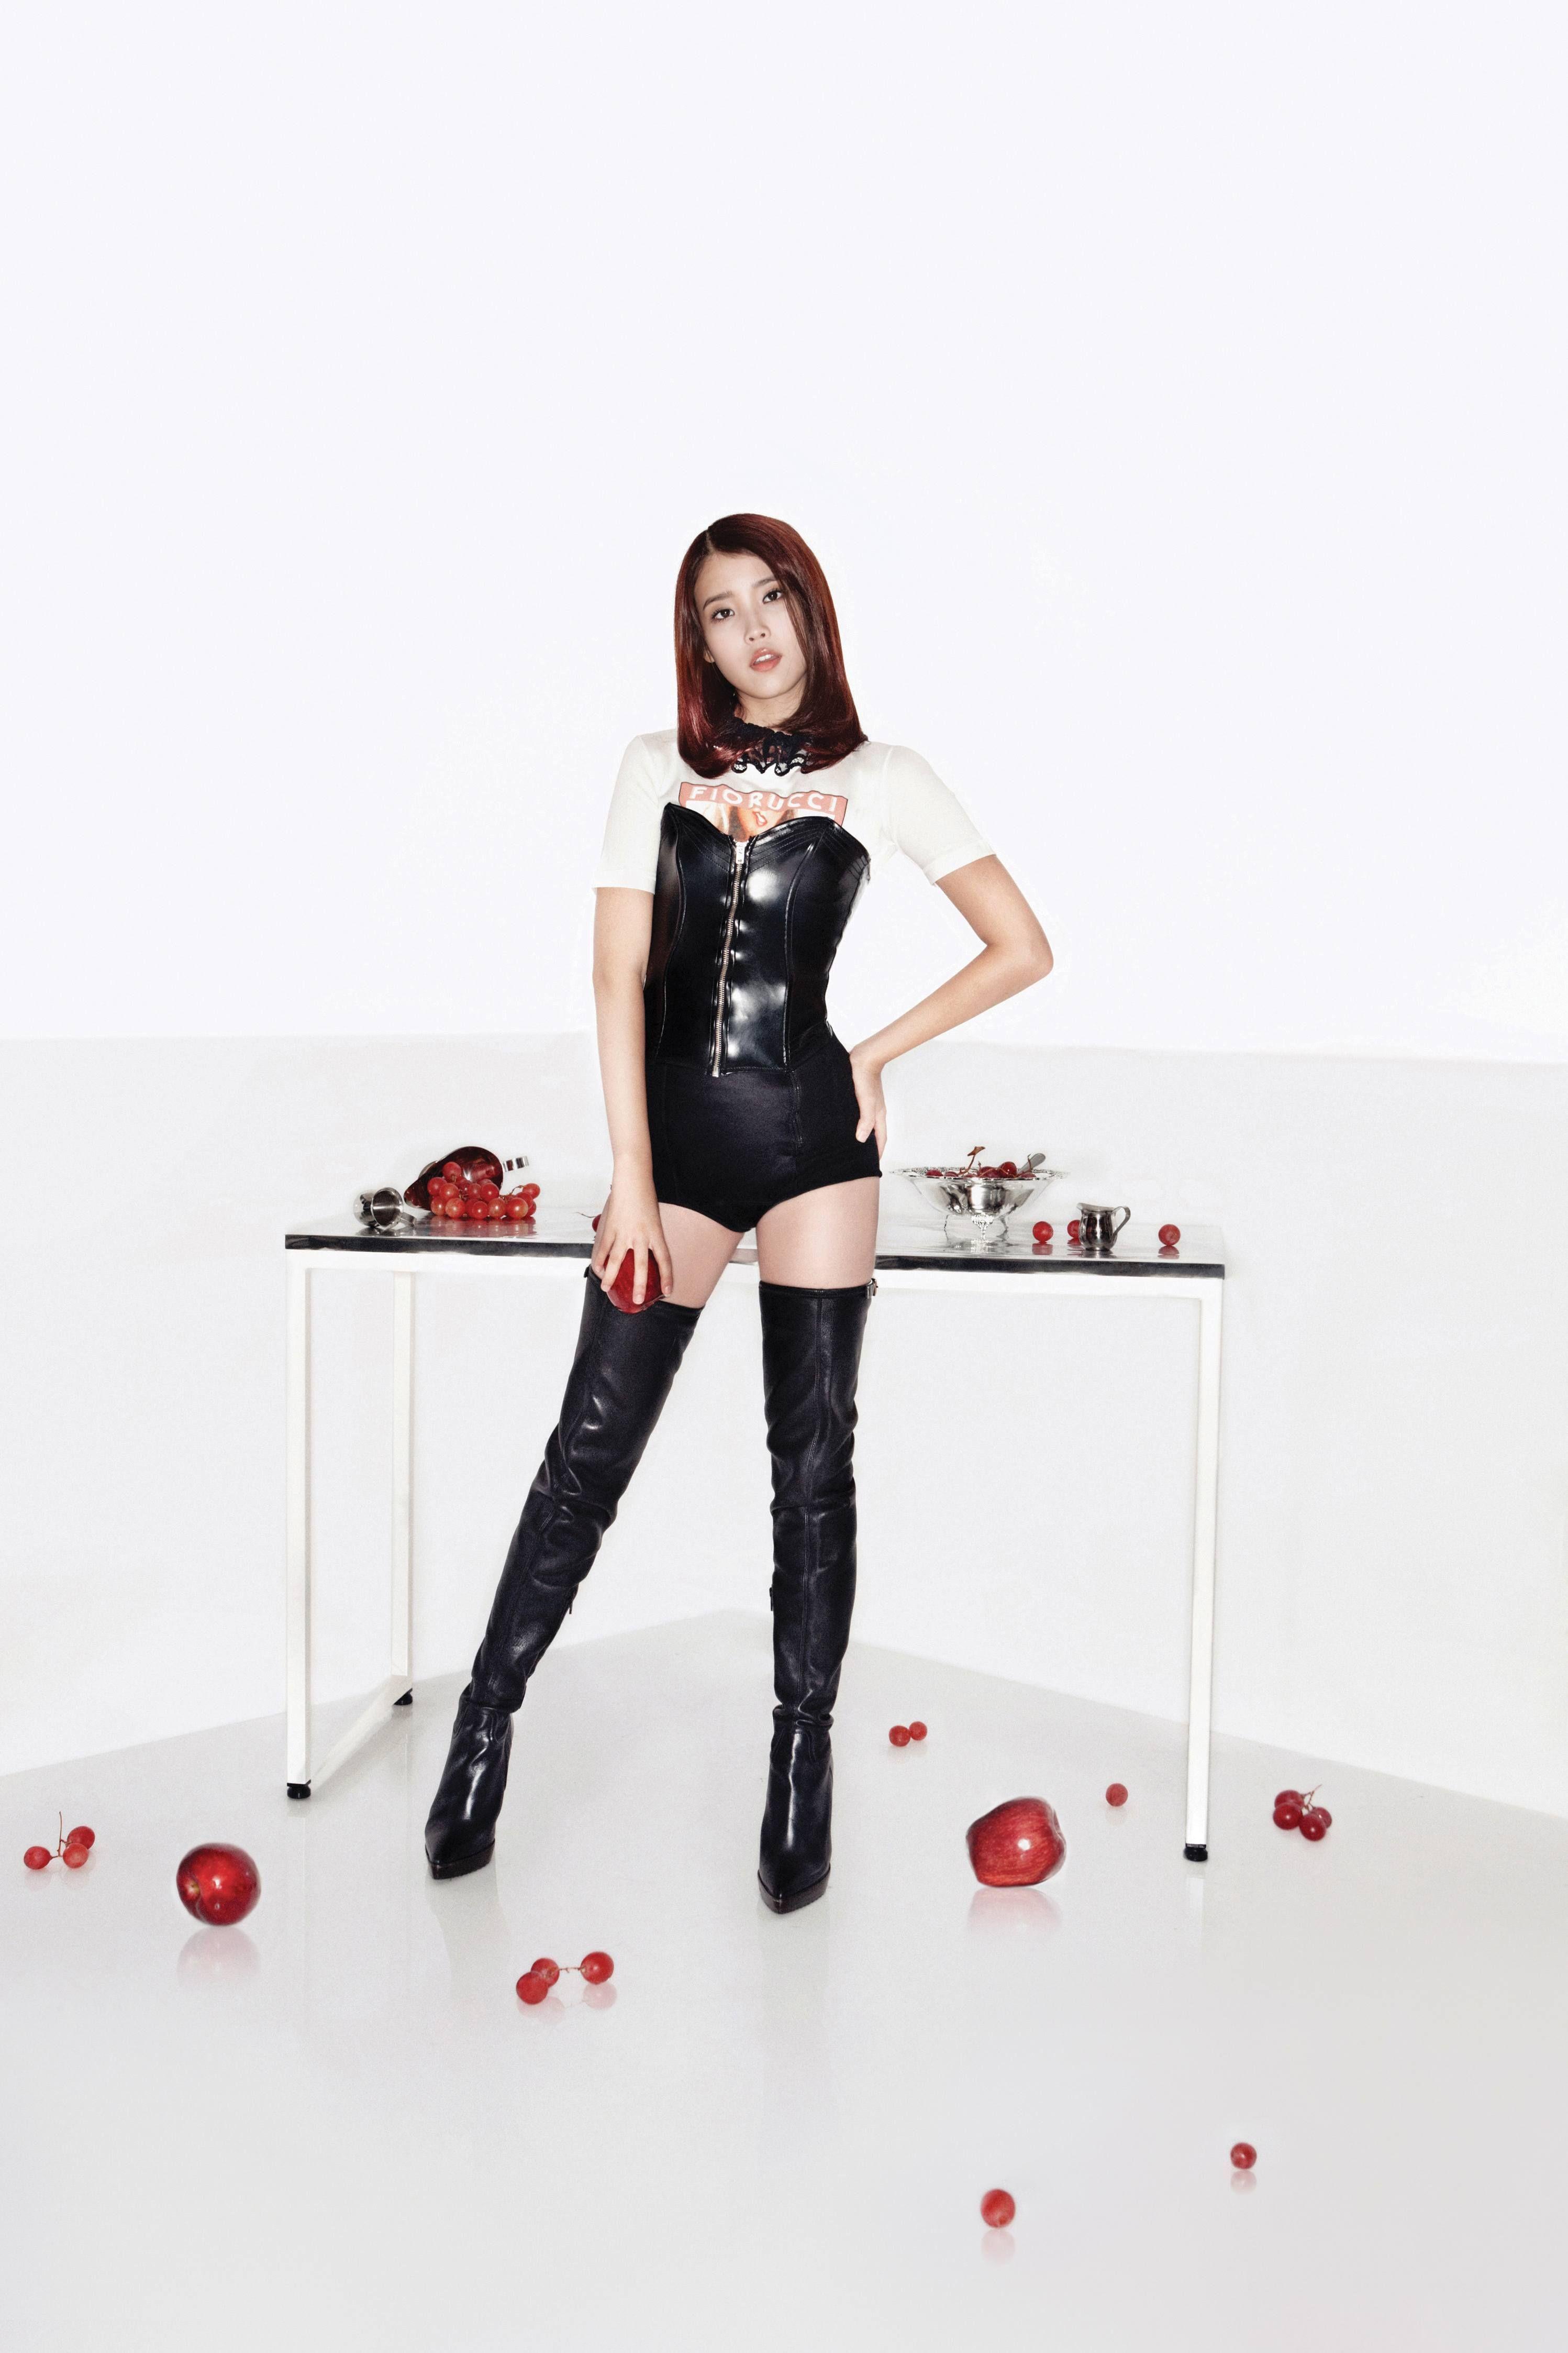 Snsd taeyeon sexy dance - 3 9